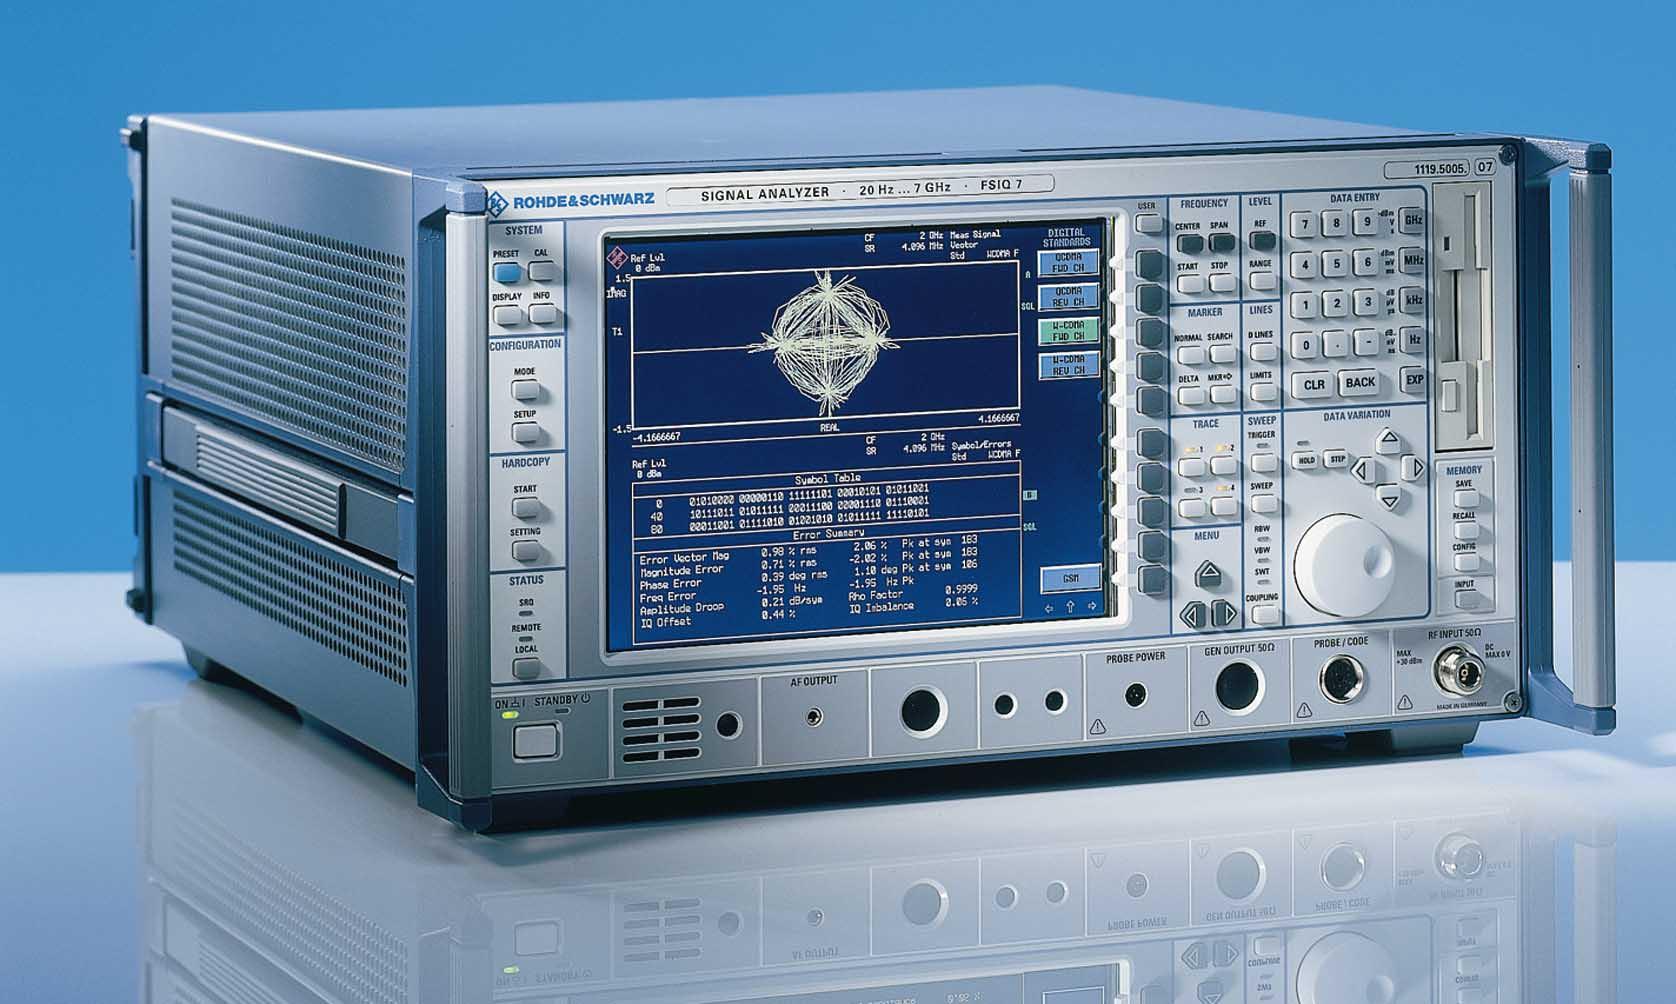 Rohde & Schwarz FSIQ Spectrum Analyzer